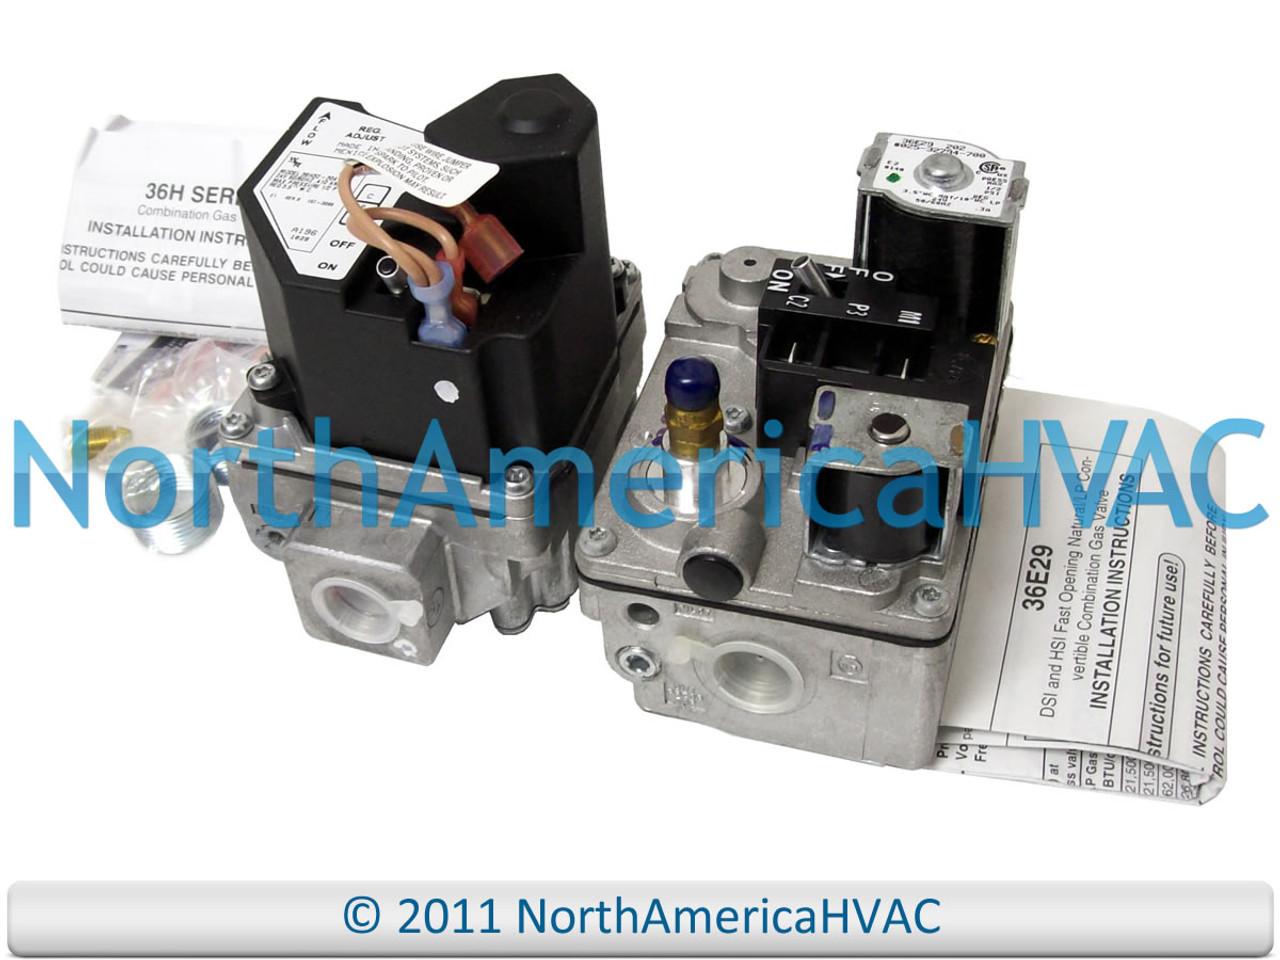 White Rodgers Furnace Gas Valve 36H32 423 36C68 423 - North America HVAC | White Rodgers Gas Valve Wiring Diagram |  | North America HVAC